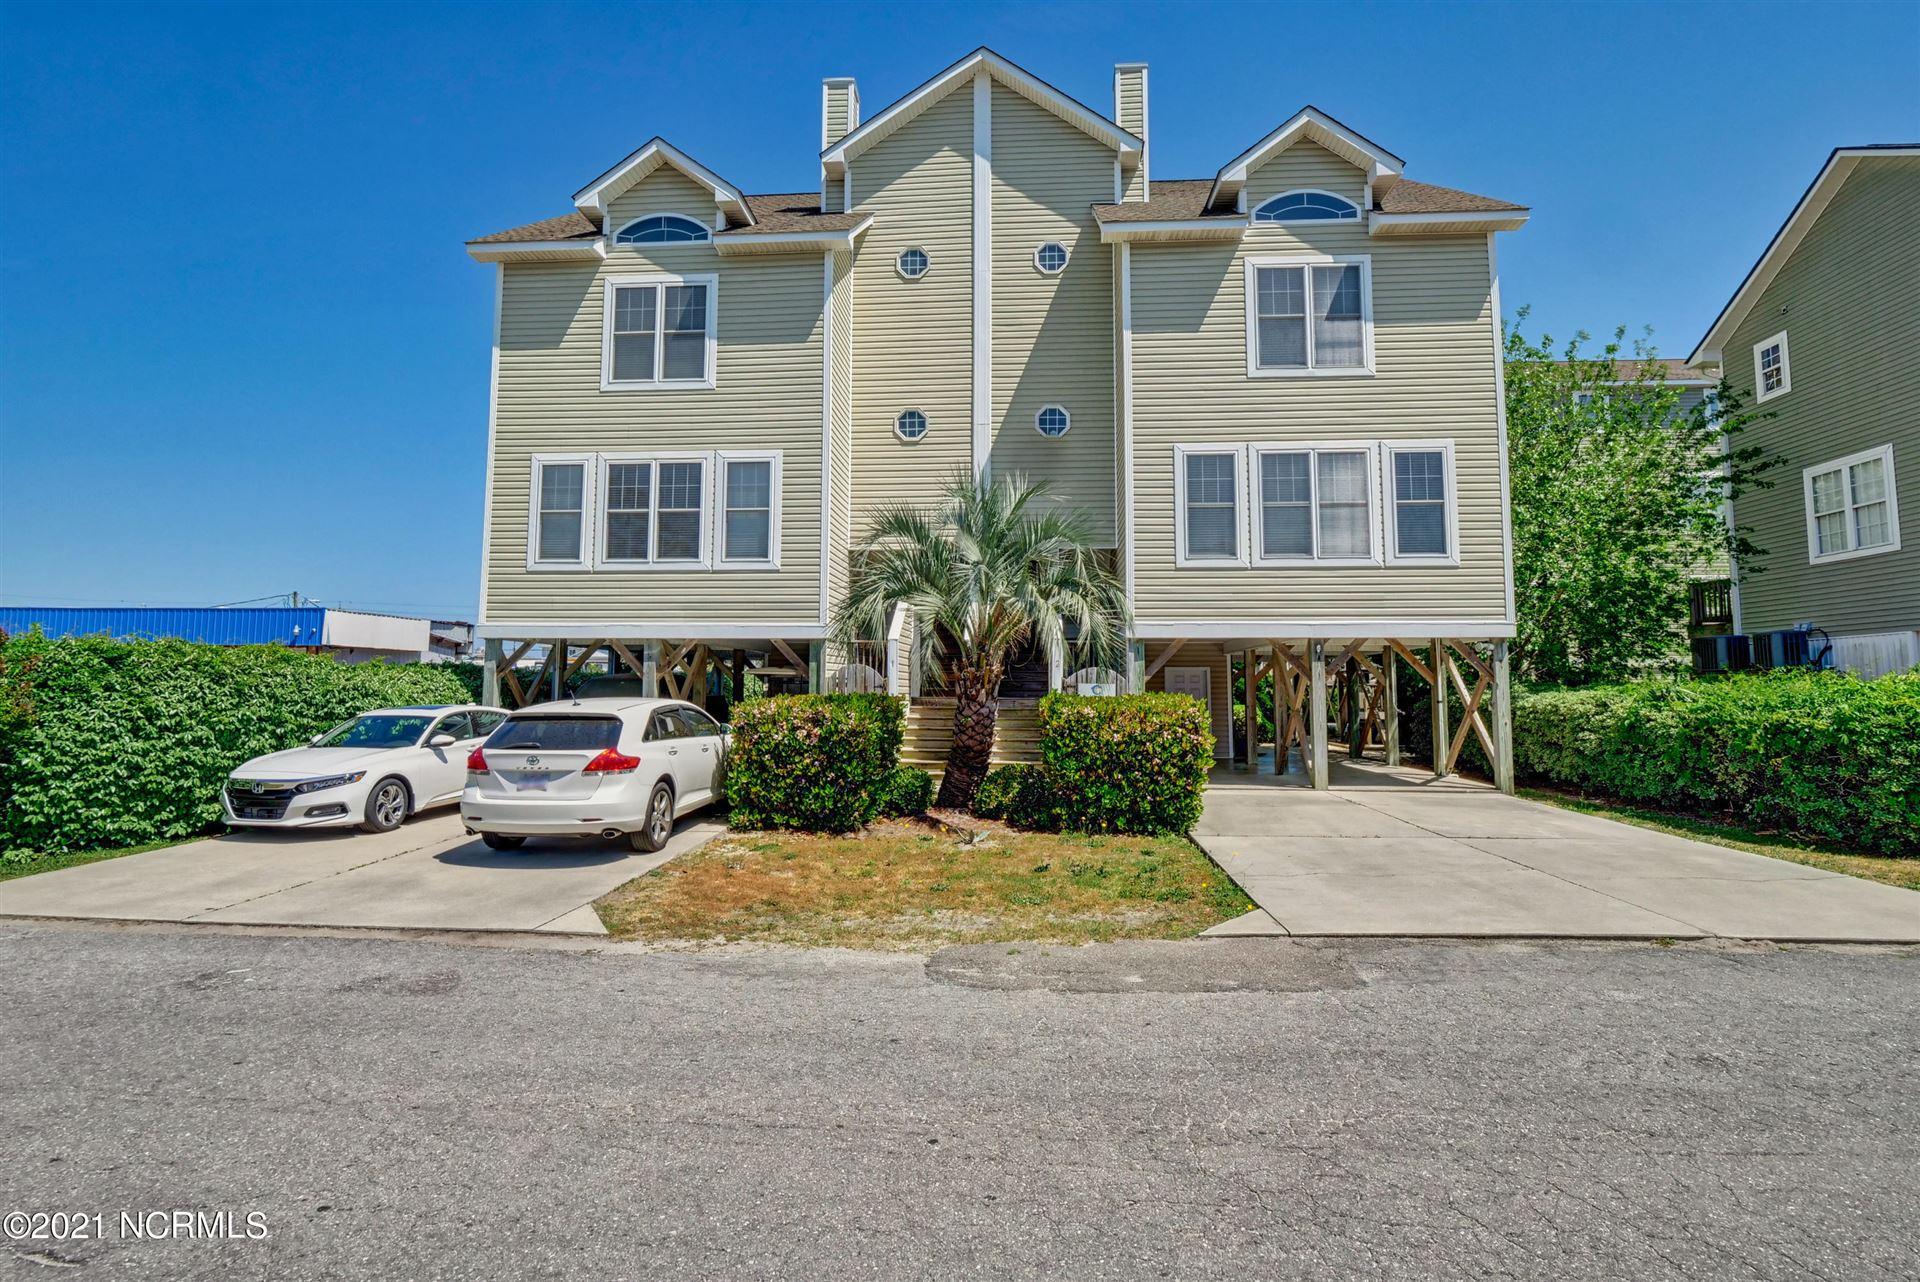 Photo for 805 S Second Street #2, Carolina Beach, NC 28428 (MLS # 100268859)